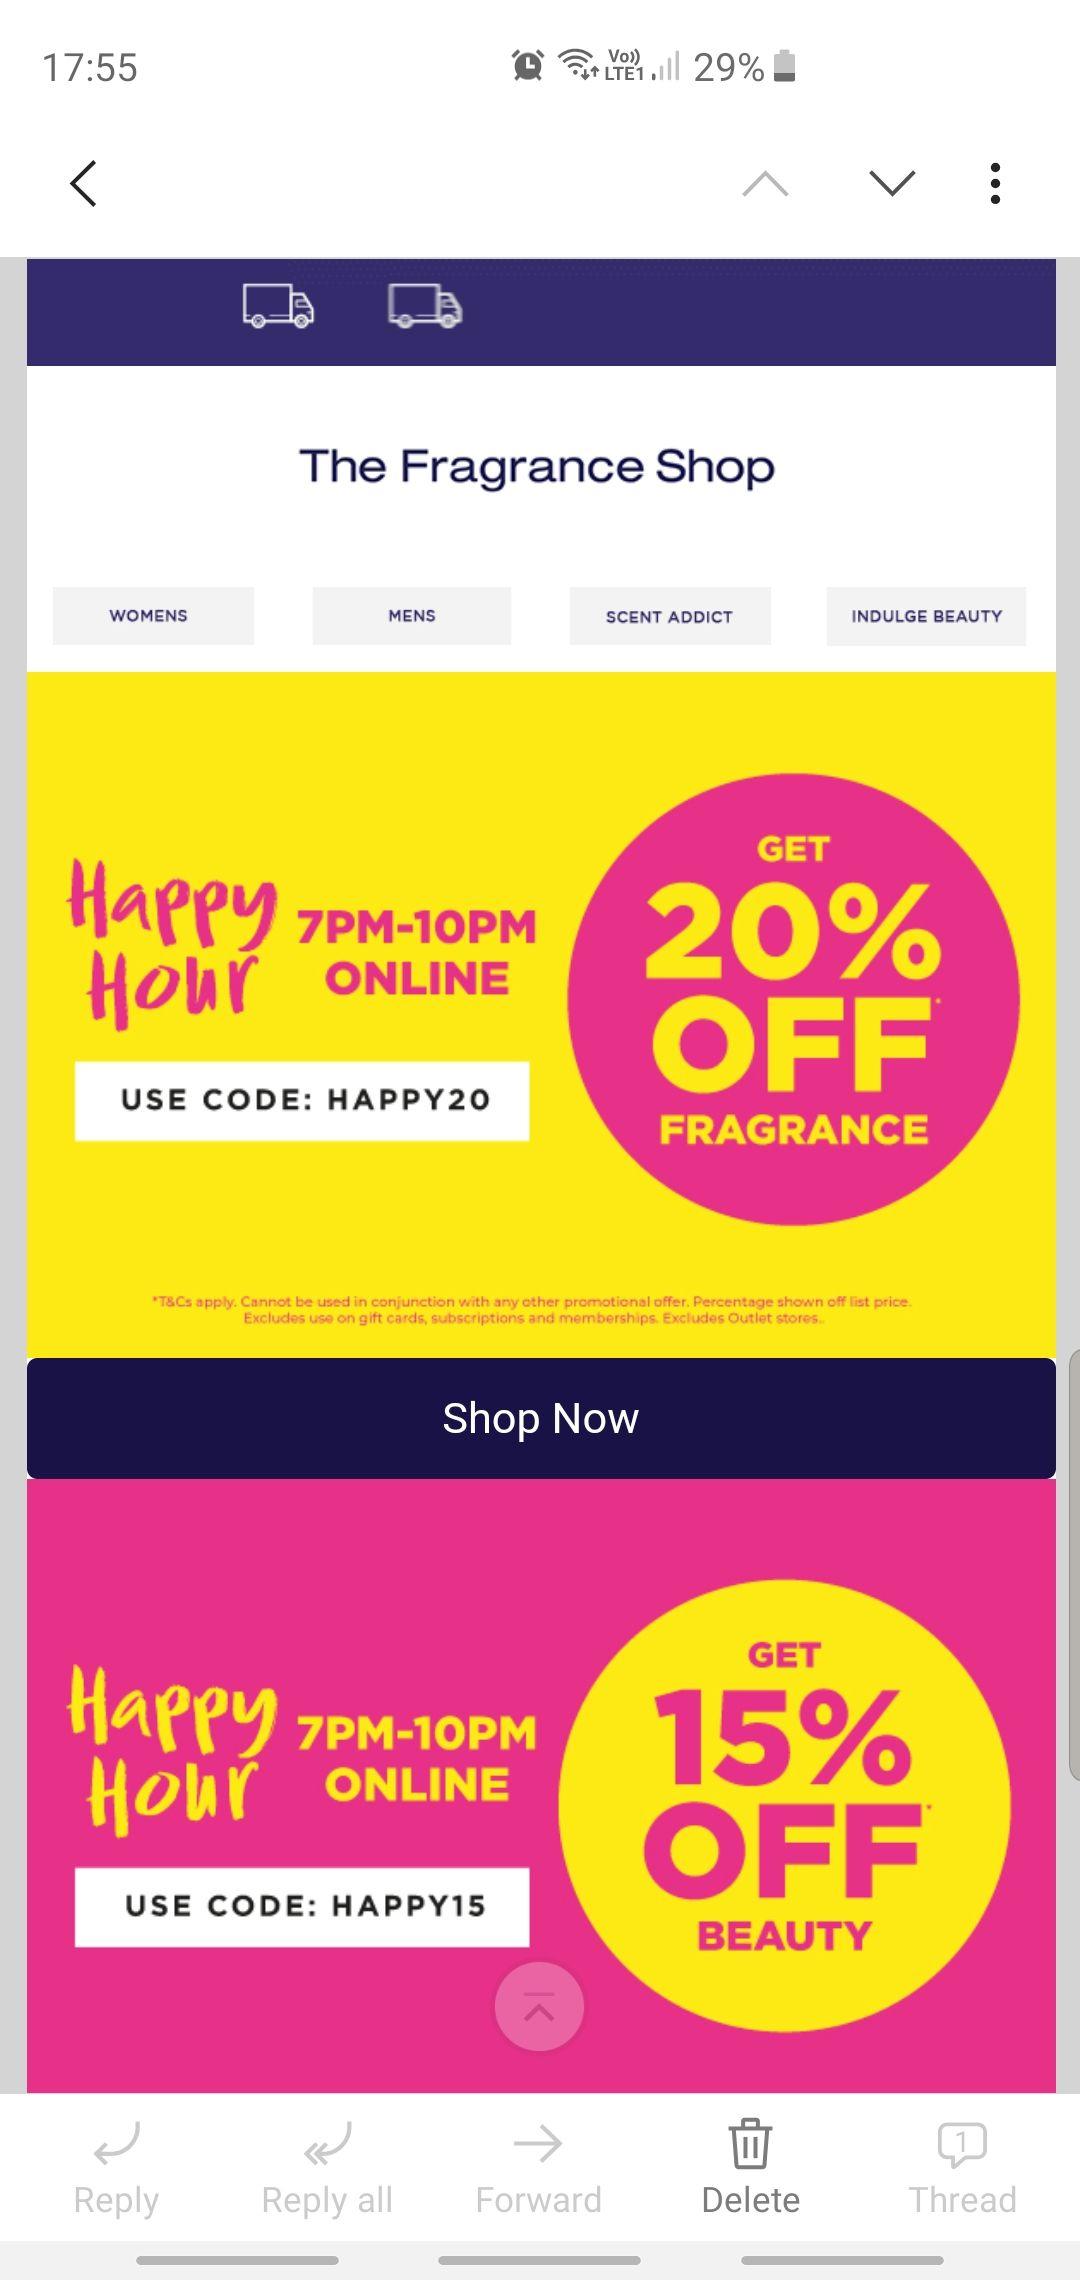 Fragrance Shop - 20% Off Fragrances / 15% Off Beauty - Until 10pm